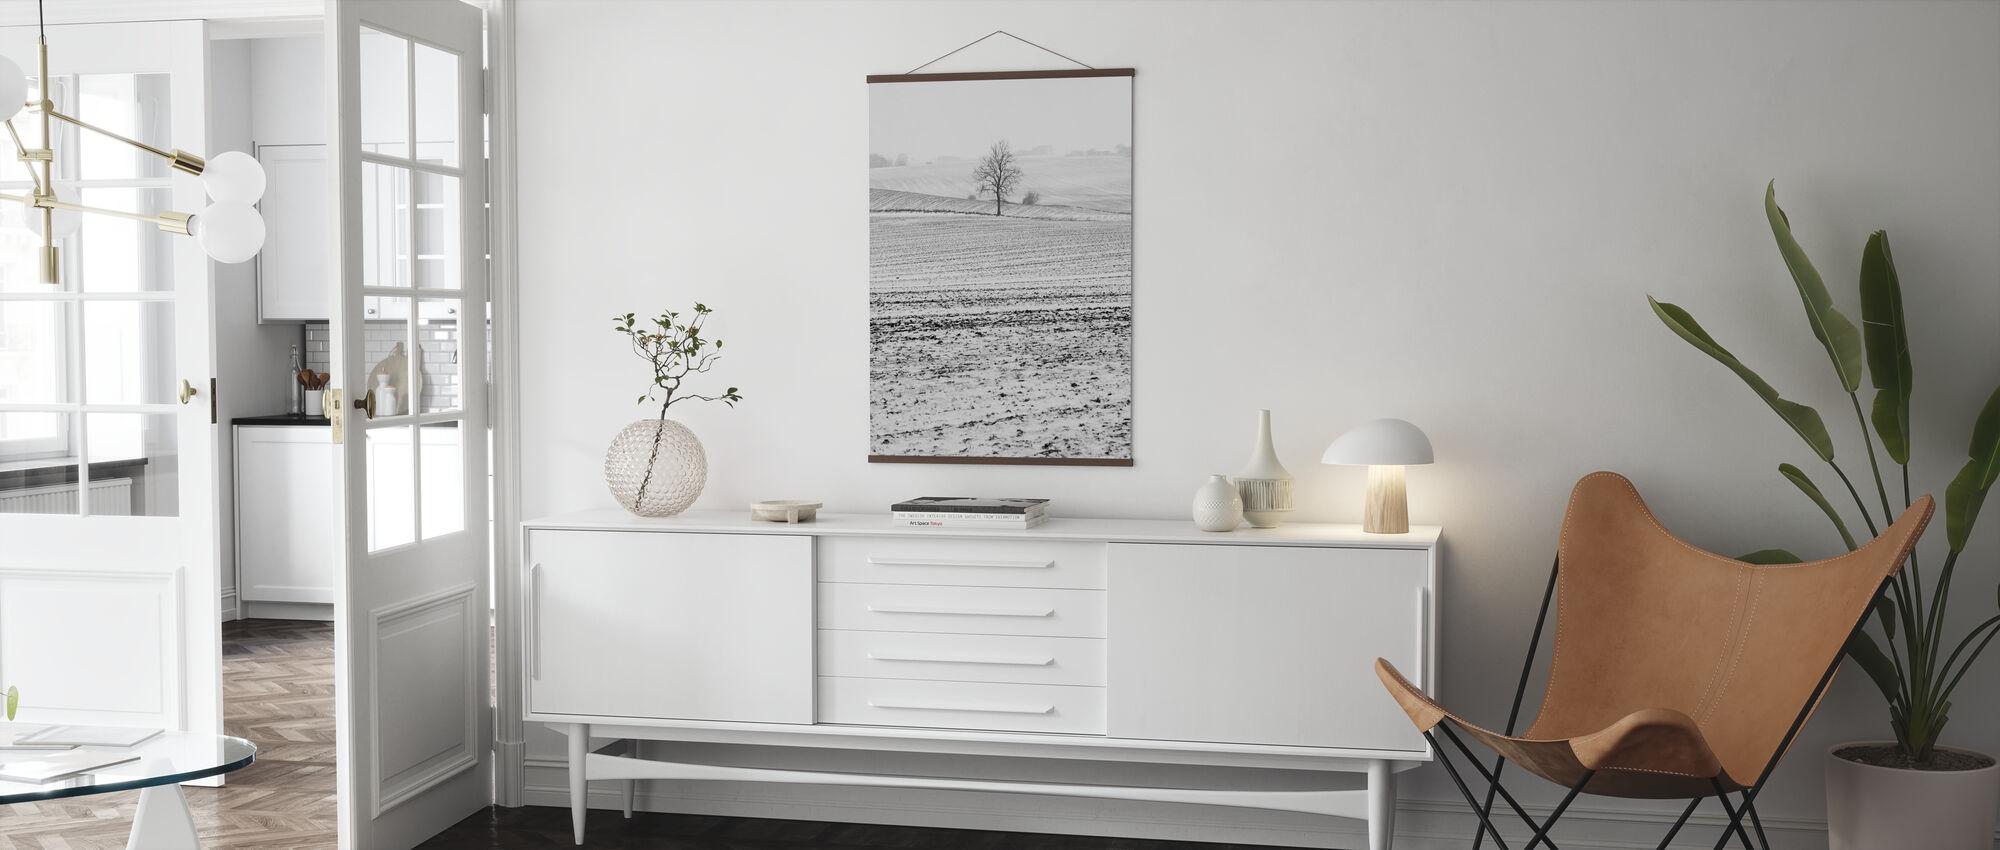 Fields in Anderslöv, Sweden - Plakat - Stue